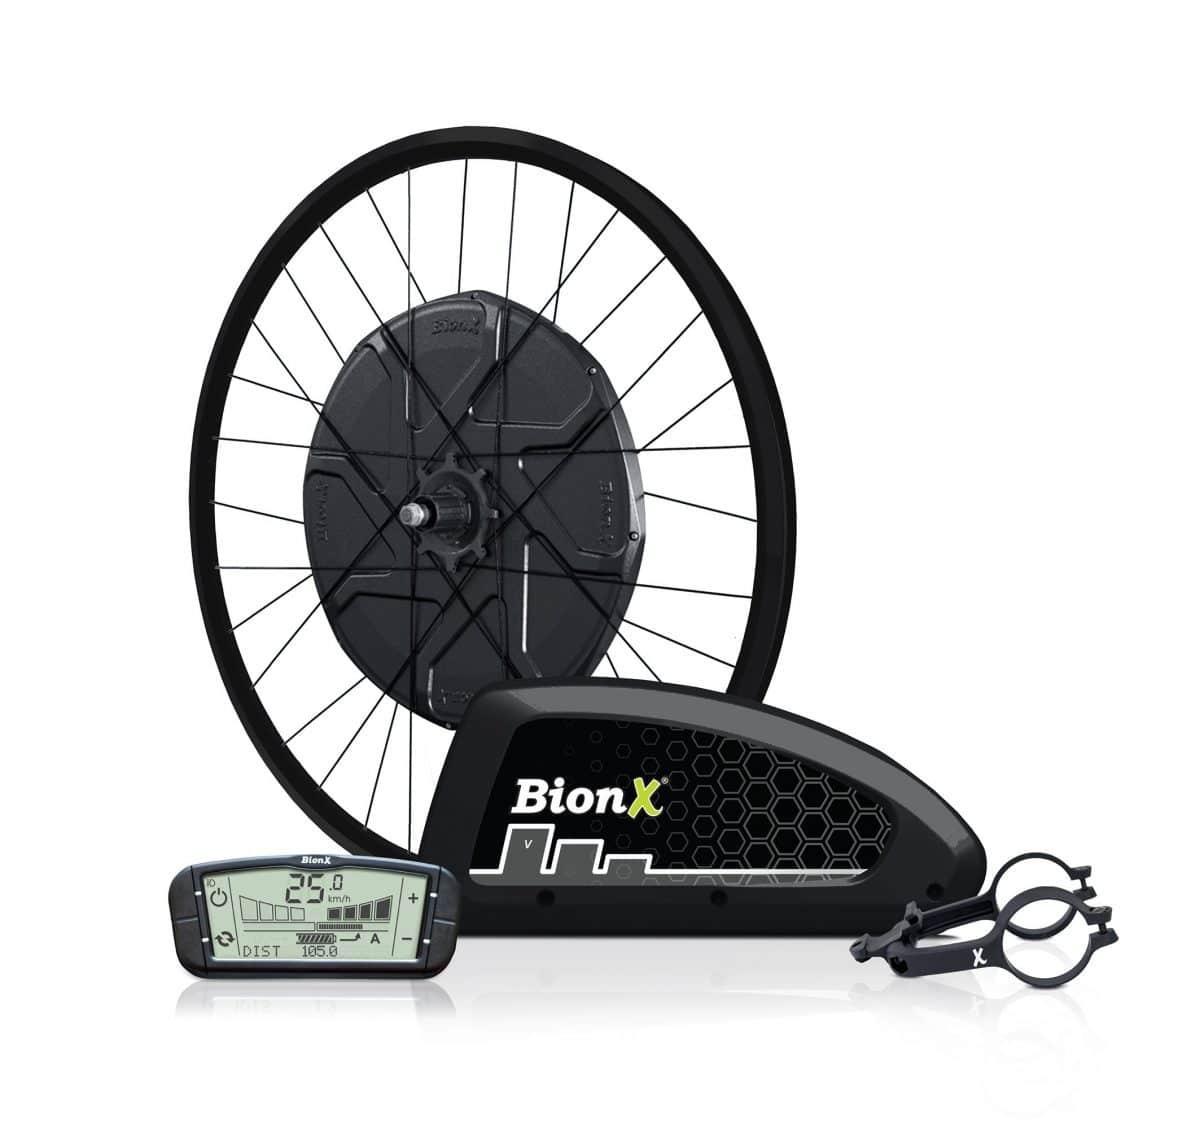 fahrrad zum e bike umr sten bionx bringt d series super. Black Bedroom Furniture Sets. Home Design Ideas